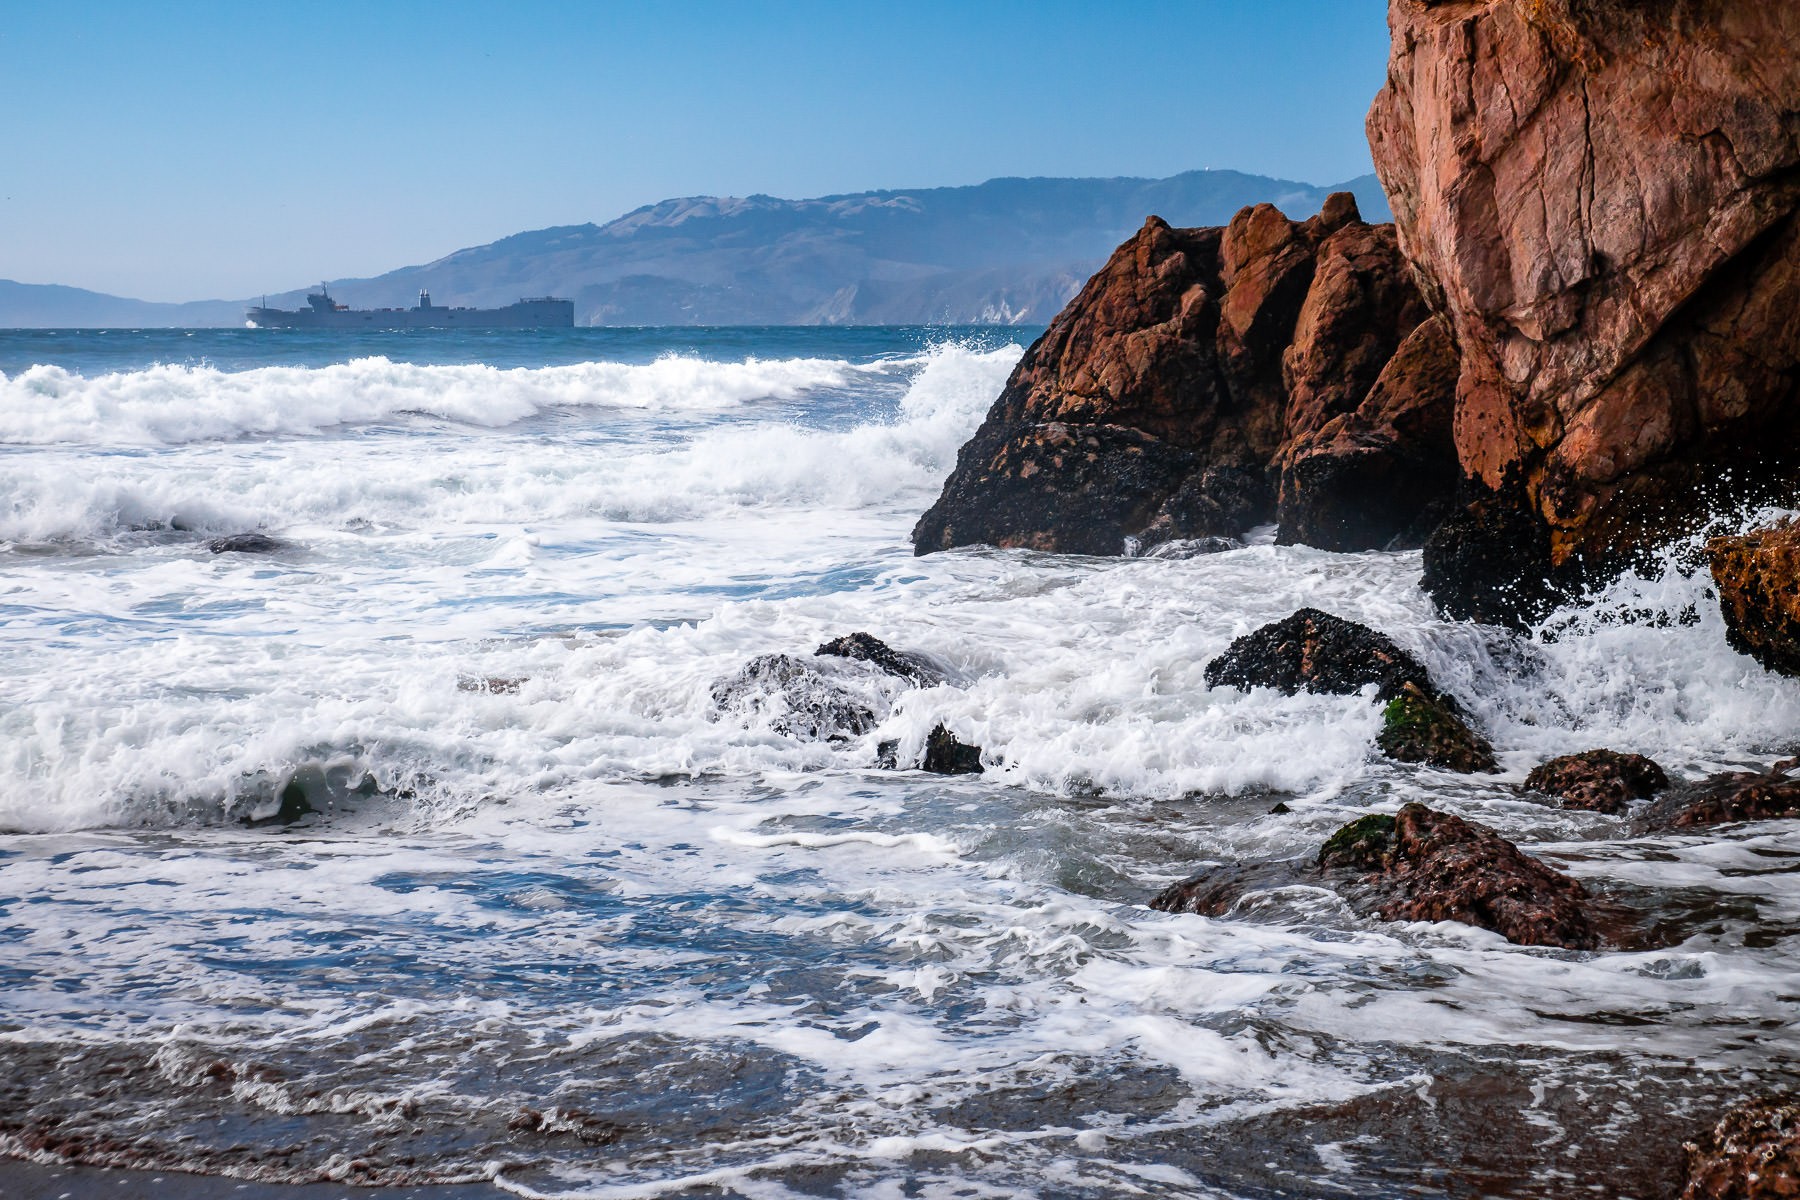 A ship sails towards San Francisco Bay, past the rocky shore at Lands End.